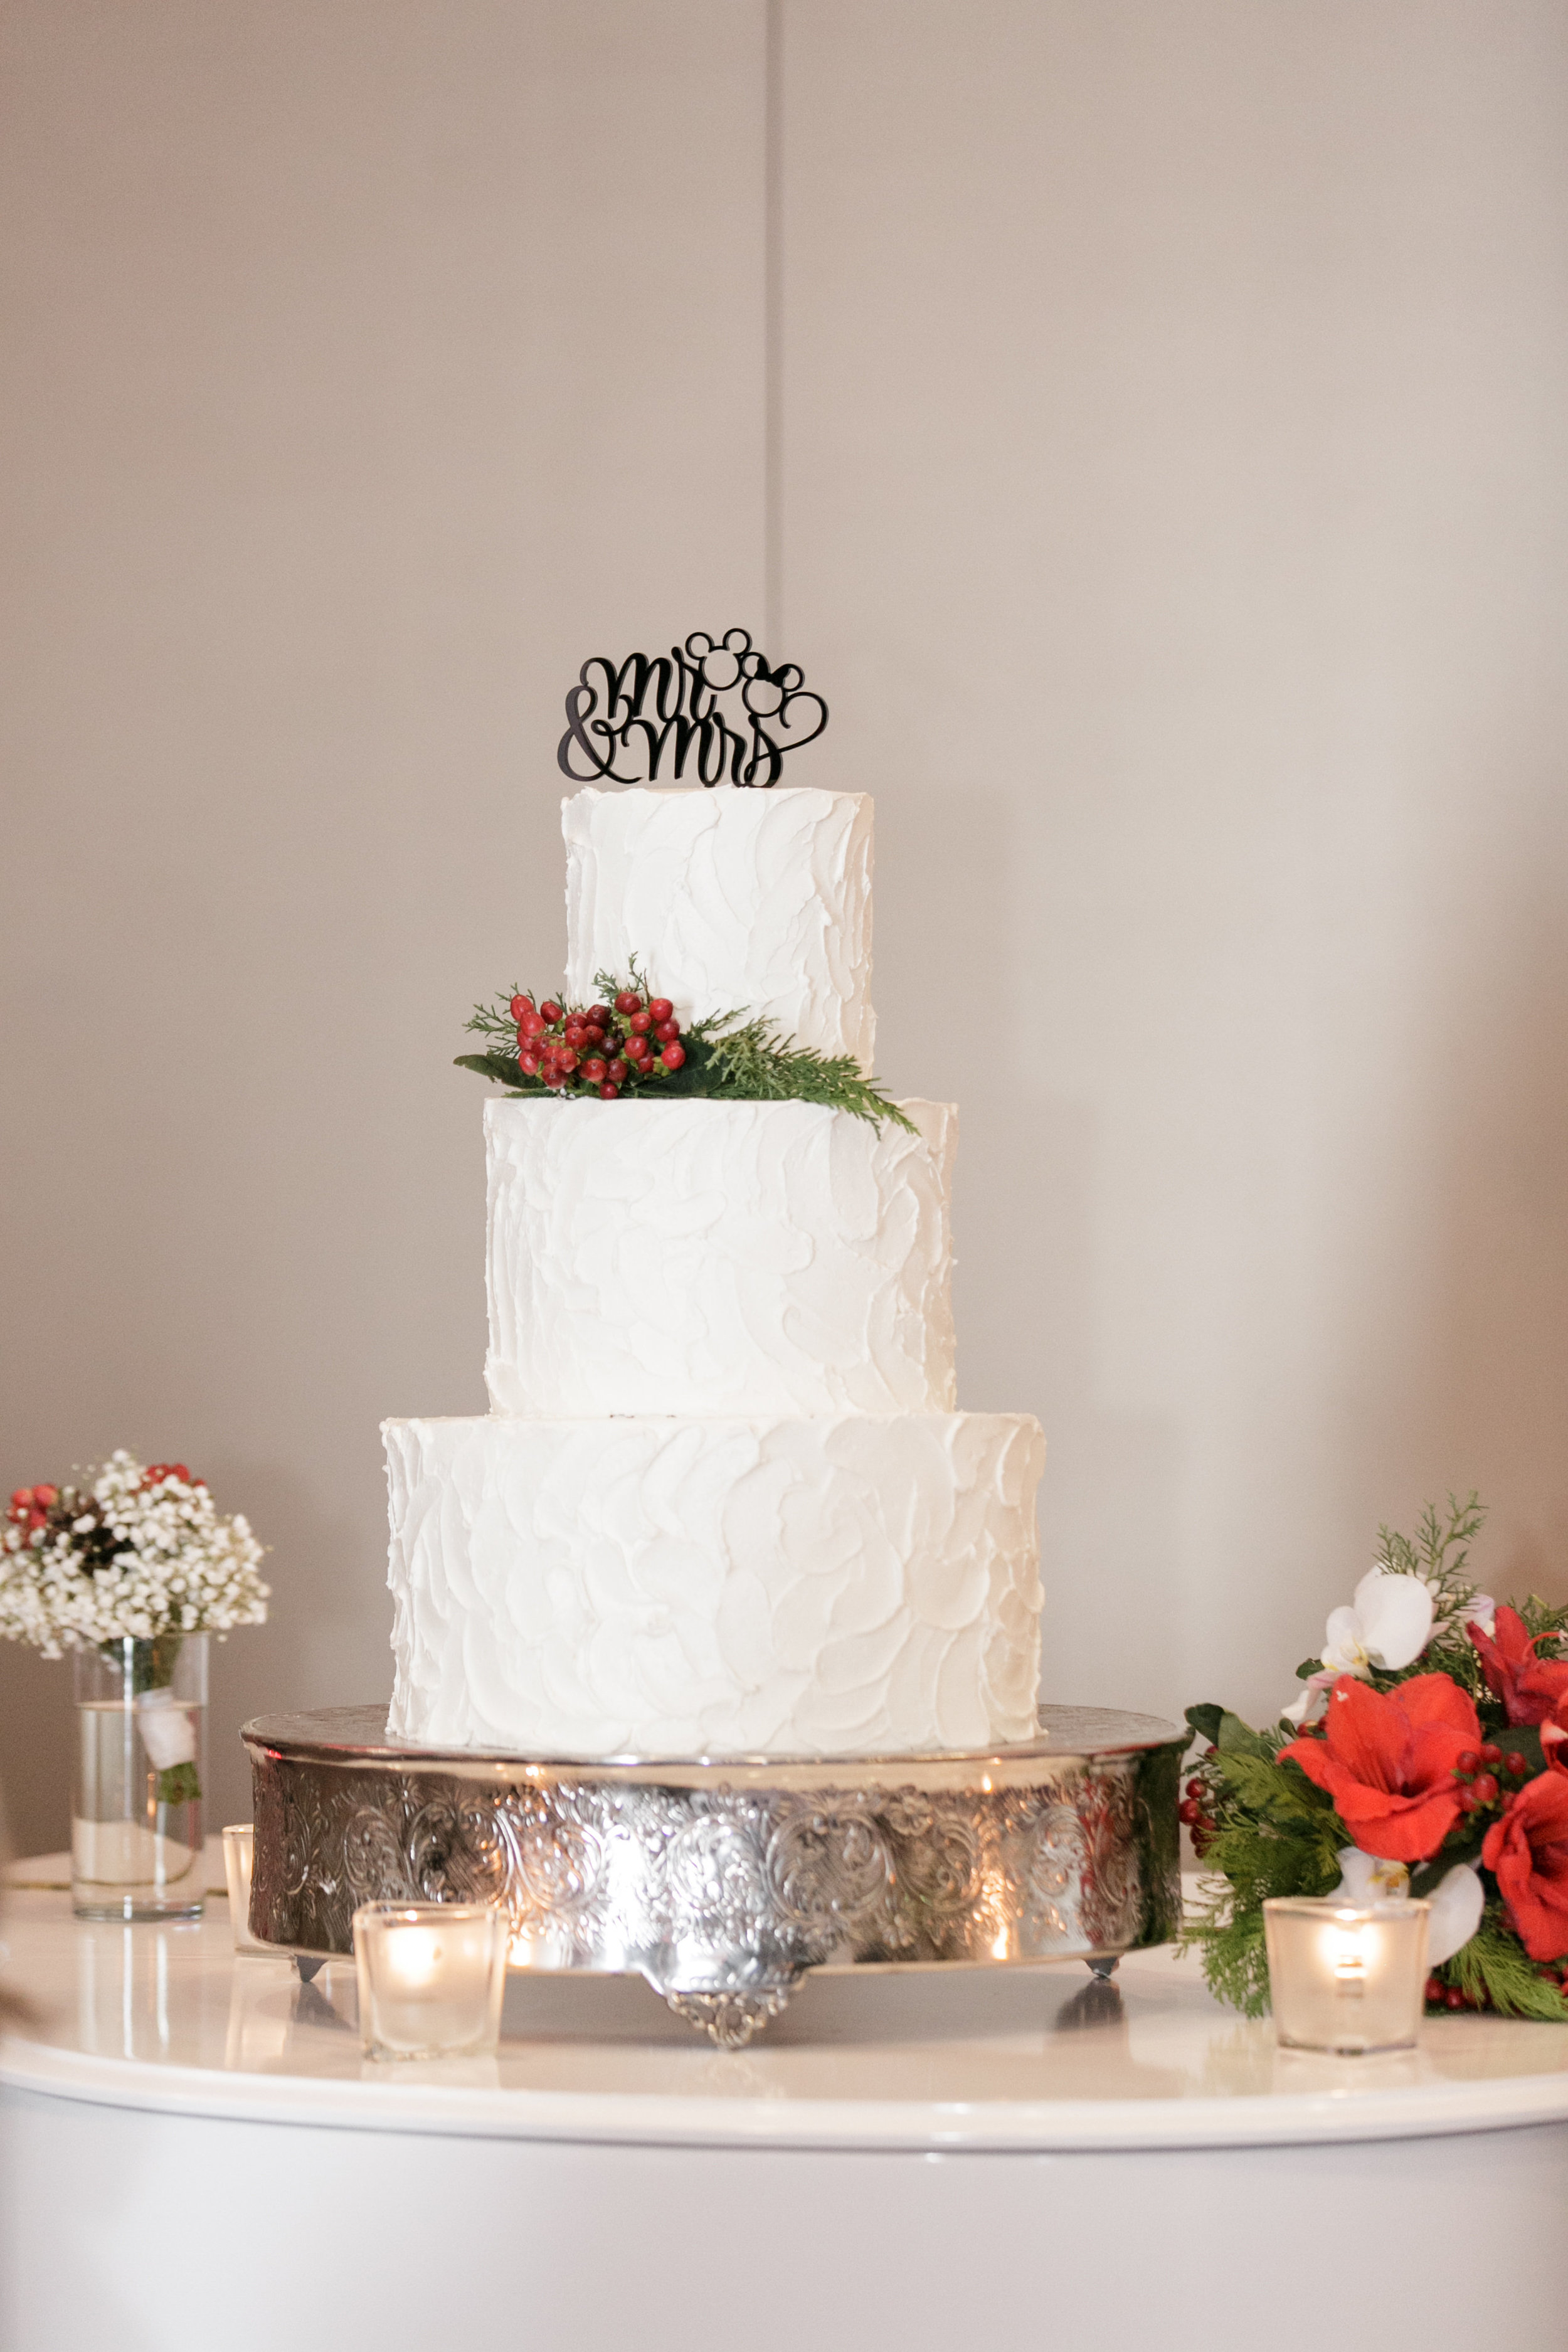 Bluegrass Chic - Christmas Wedding Cake